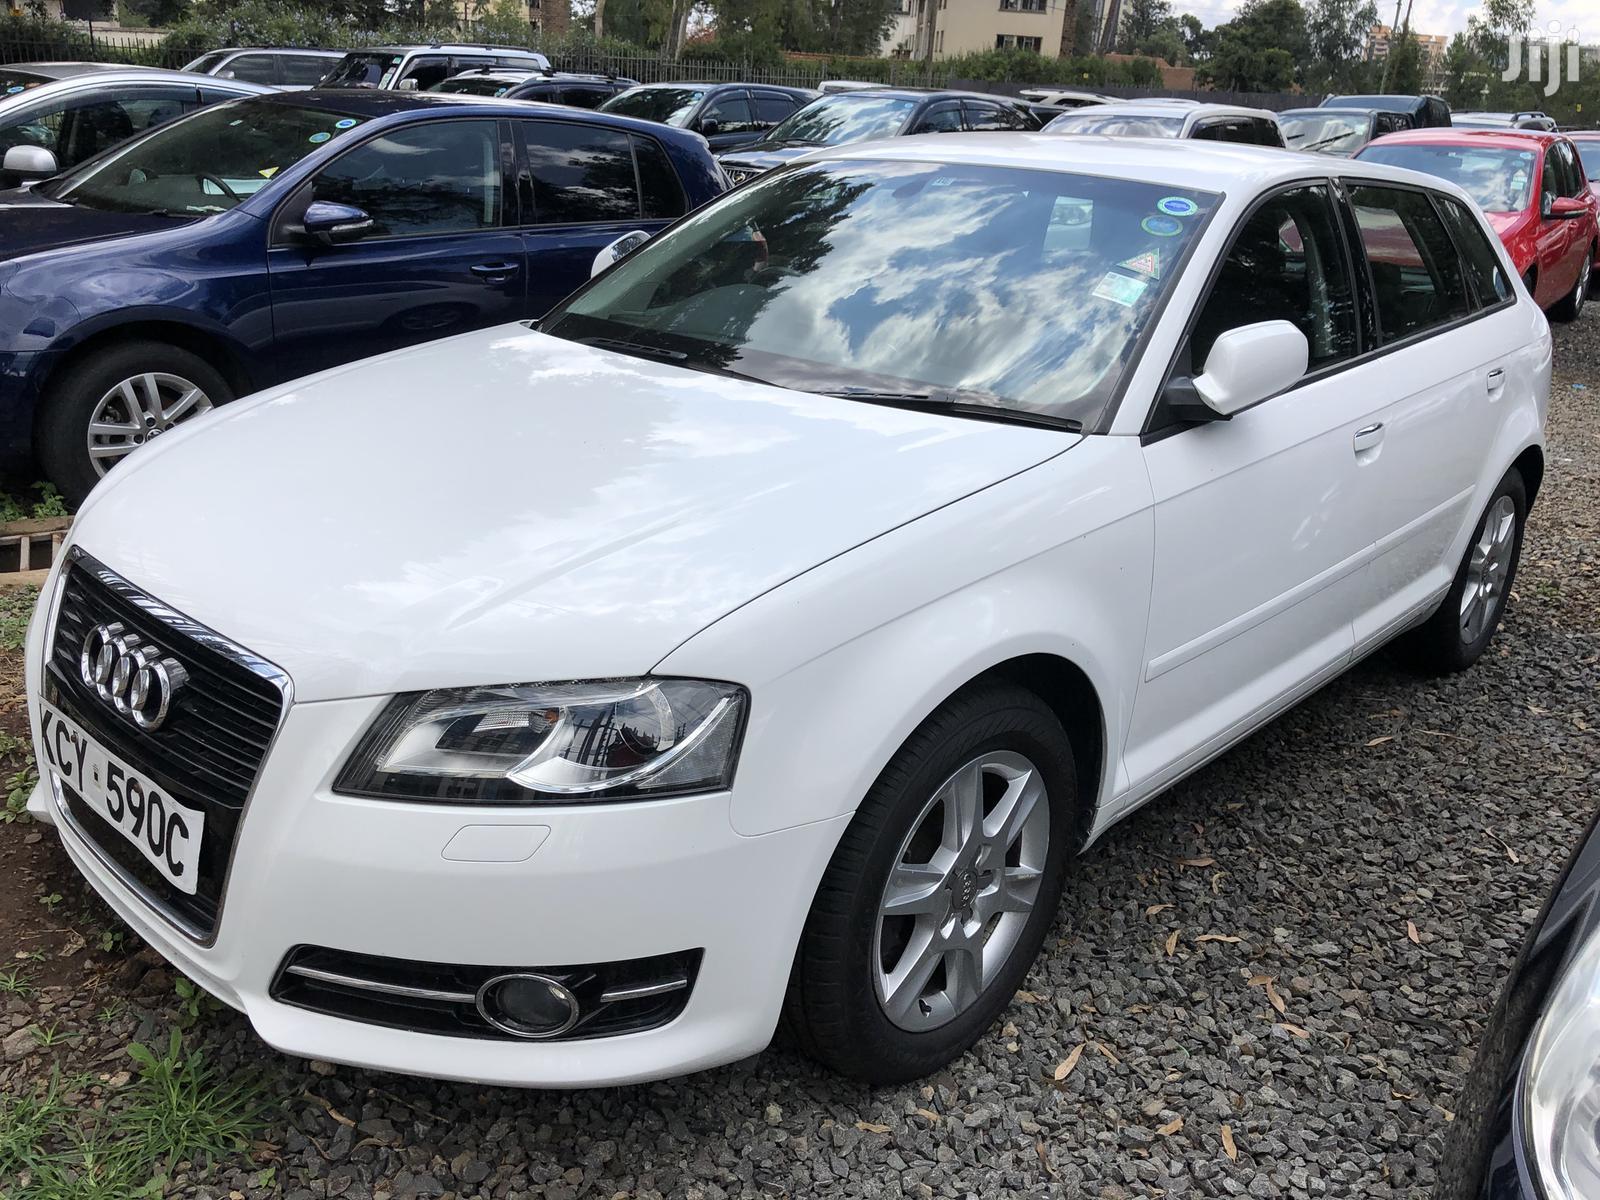 Audi A3 2012 1.4 TFSi White